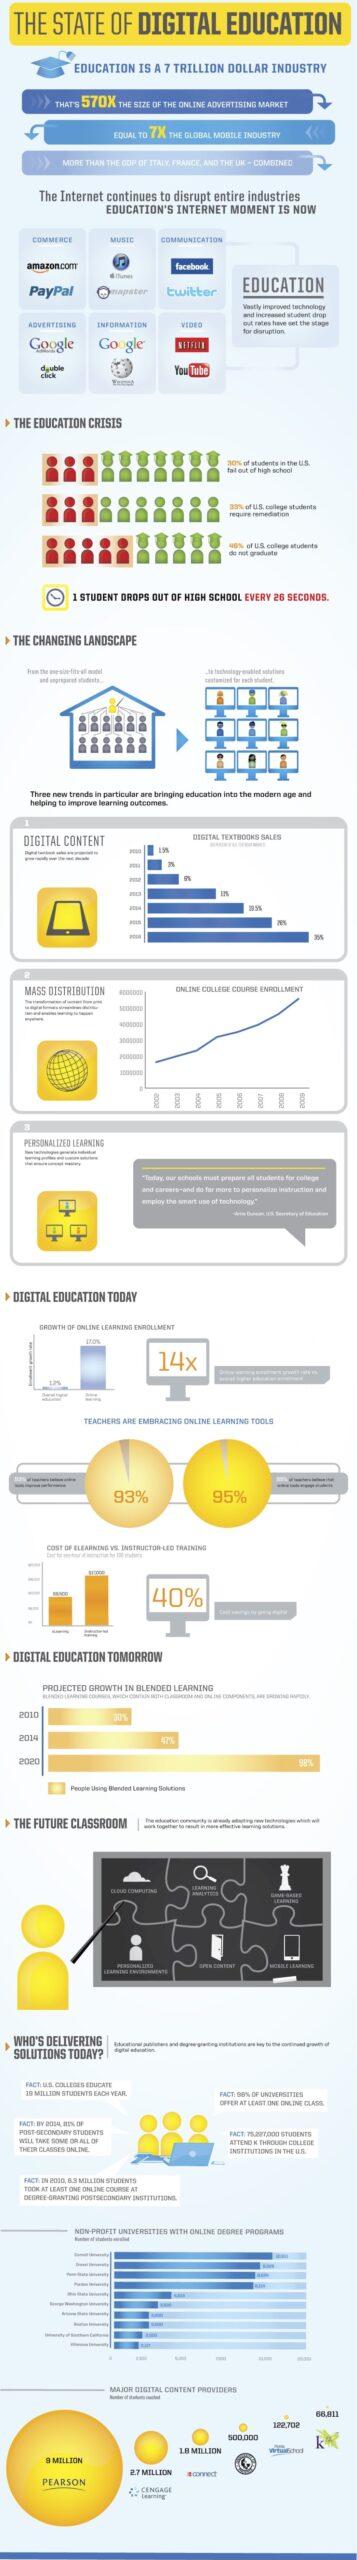 digital education infographic assignmentbro